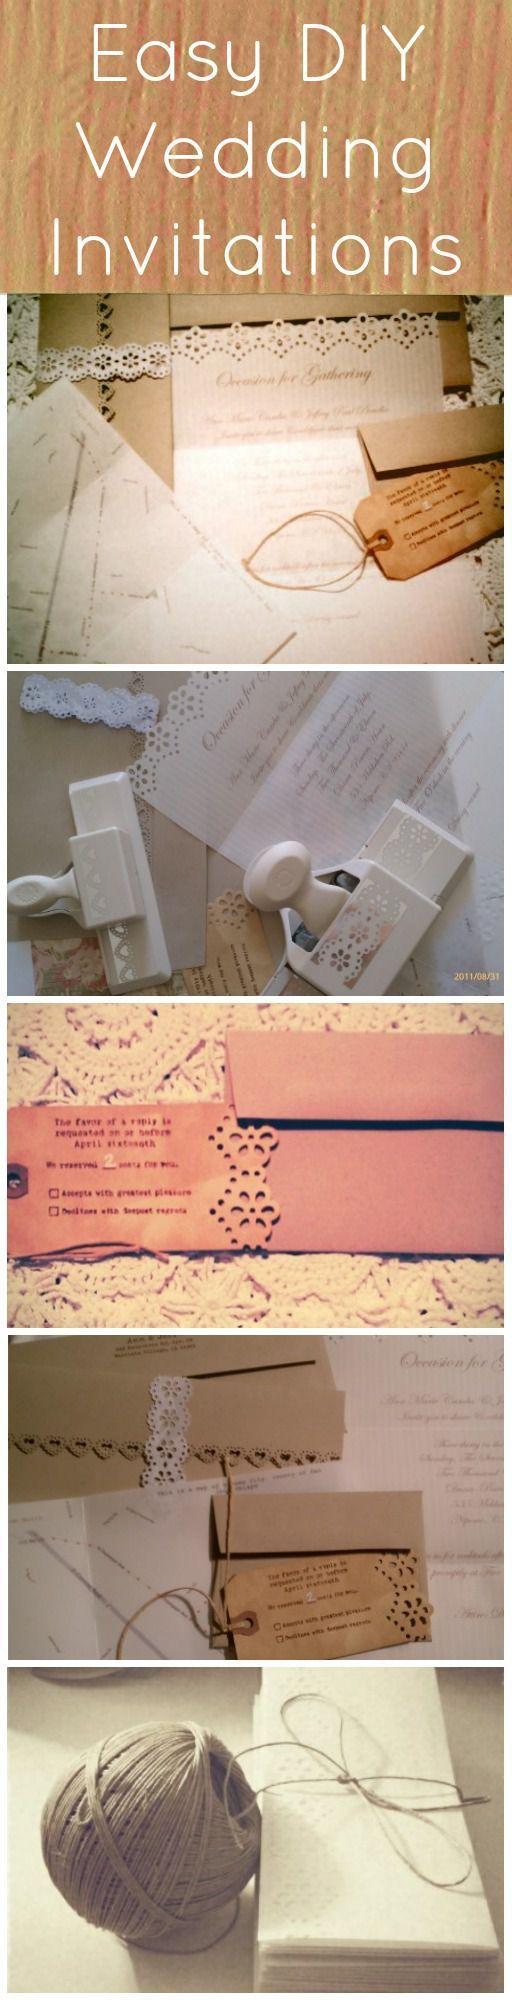 Easy DIY Wedding Invitation